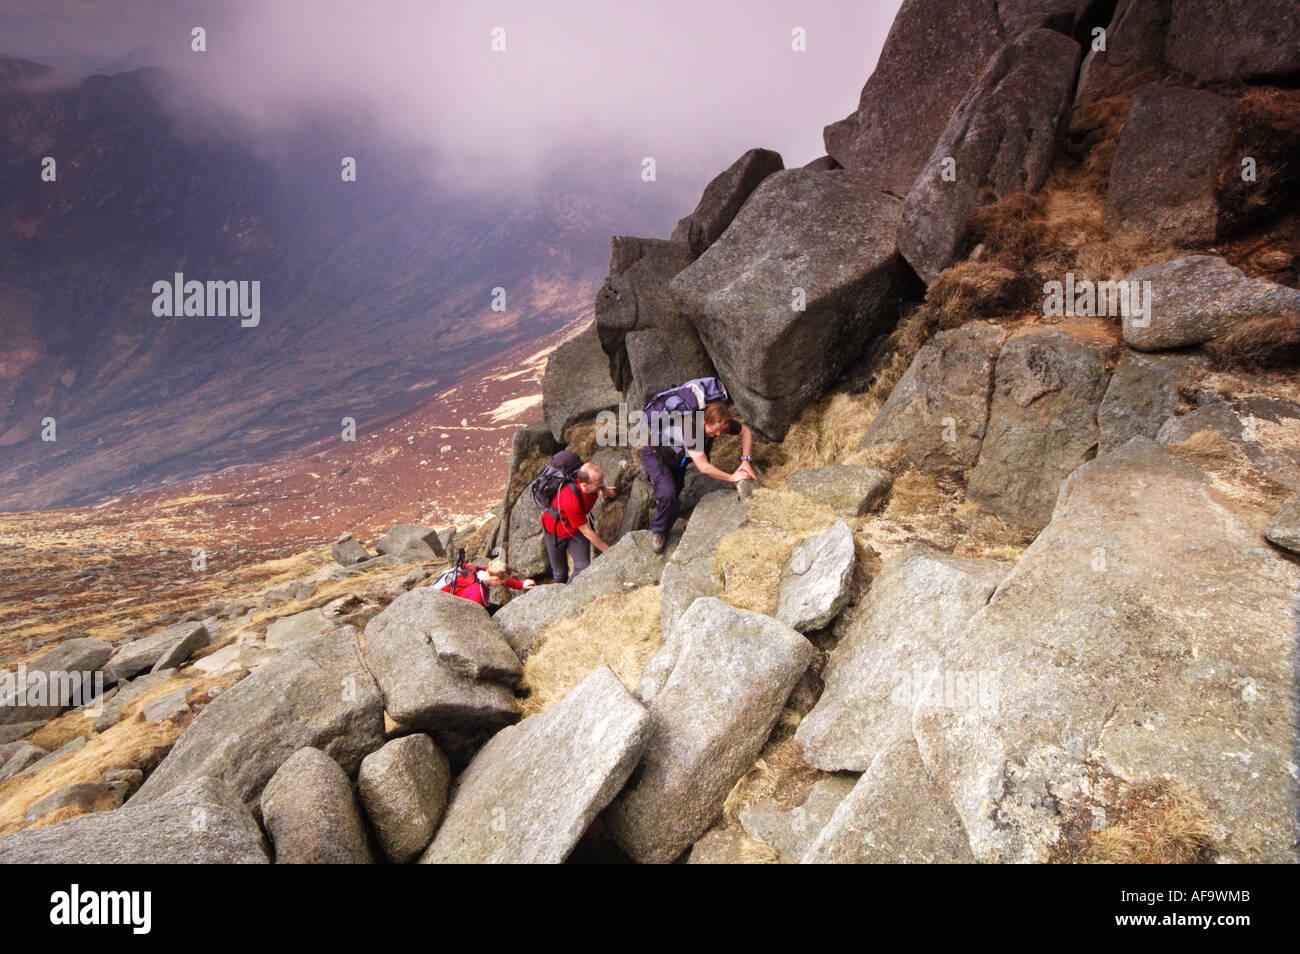 Walkers scrambling on North Goatfell, Isle of Arran, Scotland female - Stock Image